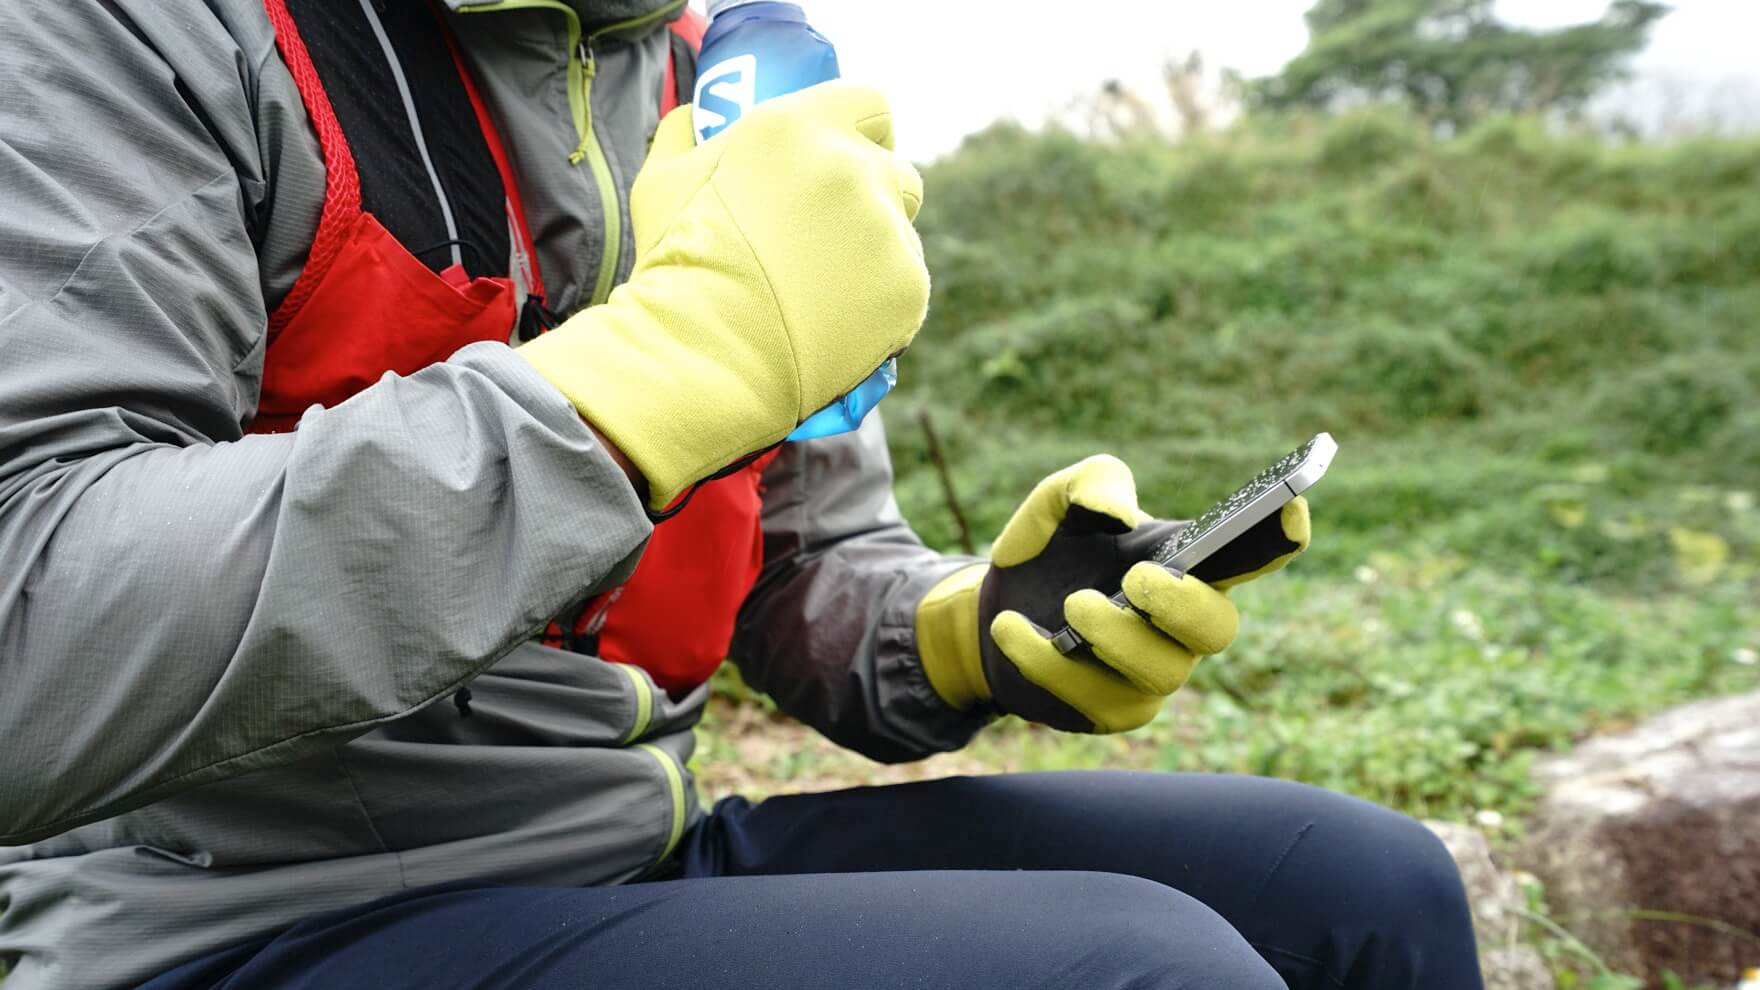 Review:handson grip Tracker 何この馴染みよさ。手袋職人の技術が集約された Japan made のアウトドアグローブ